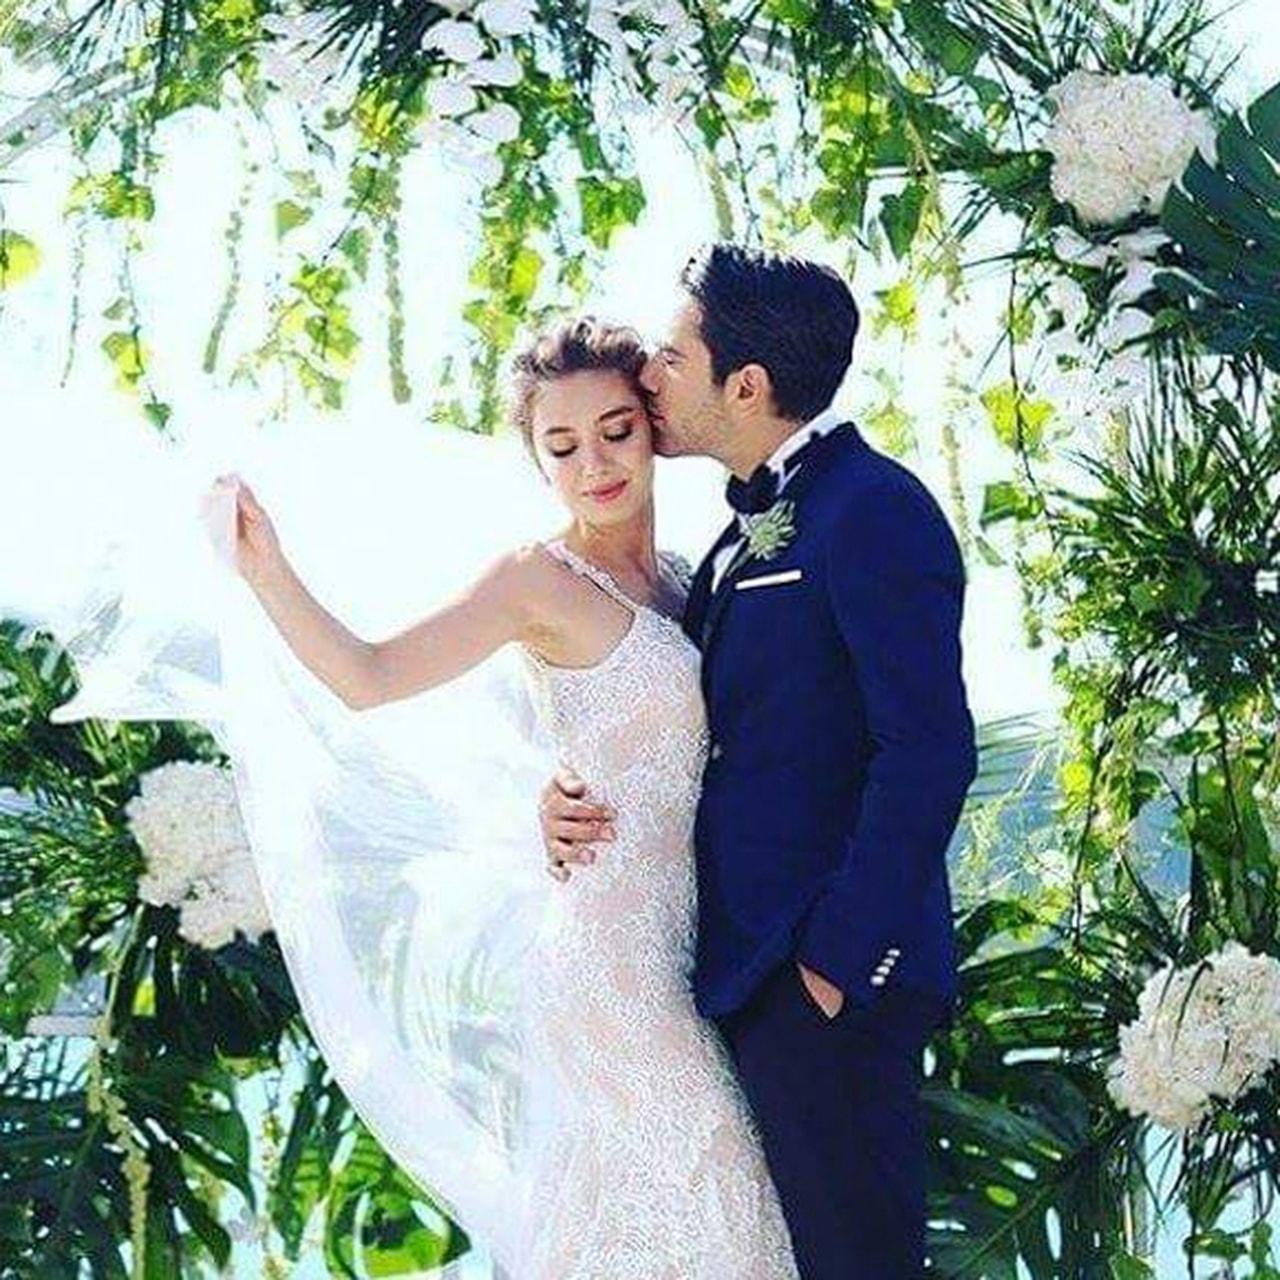 صوره صور عرسان حلوه , اجمل صور للعروسين